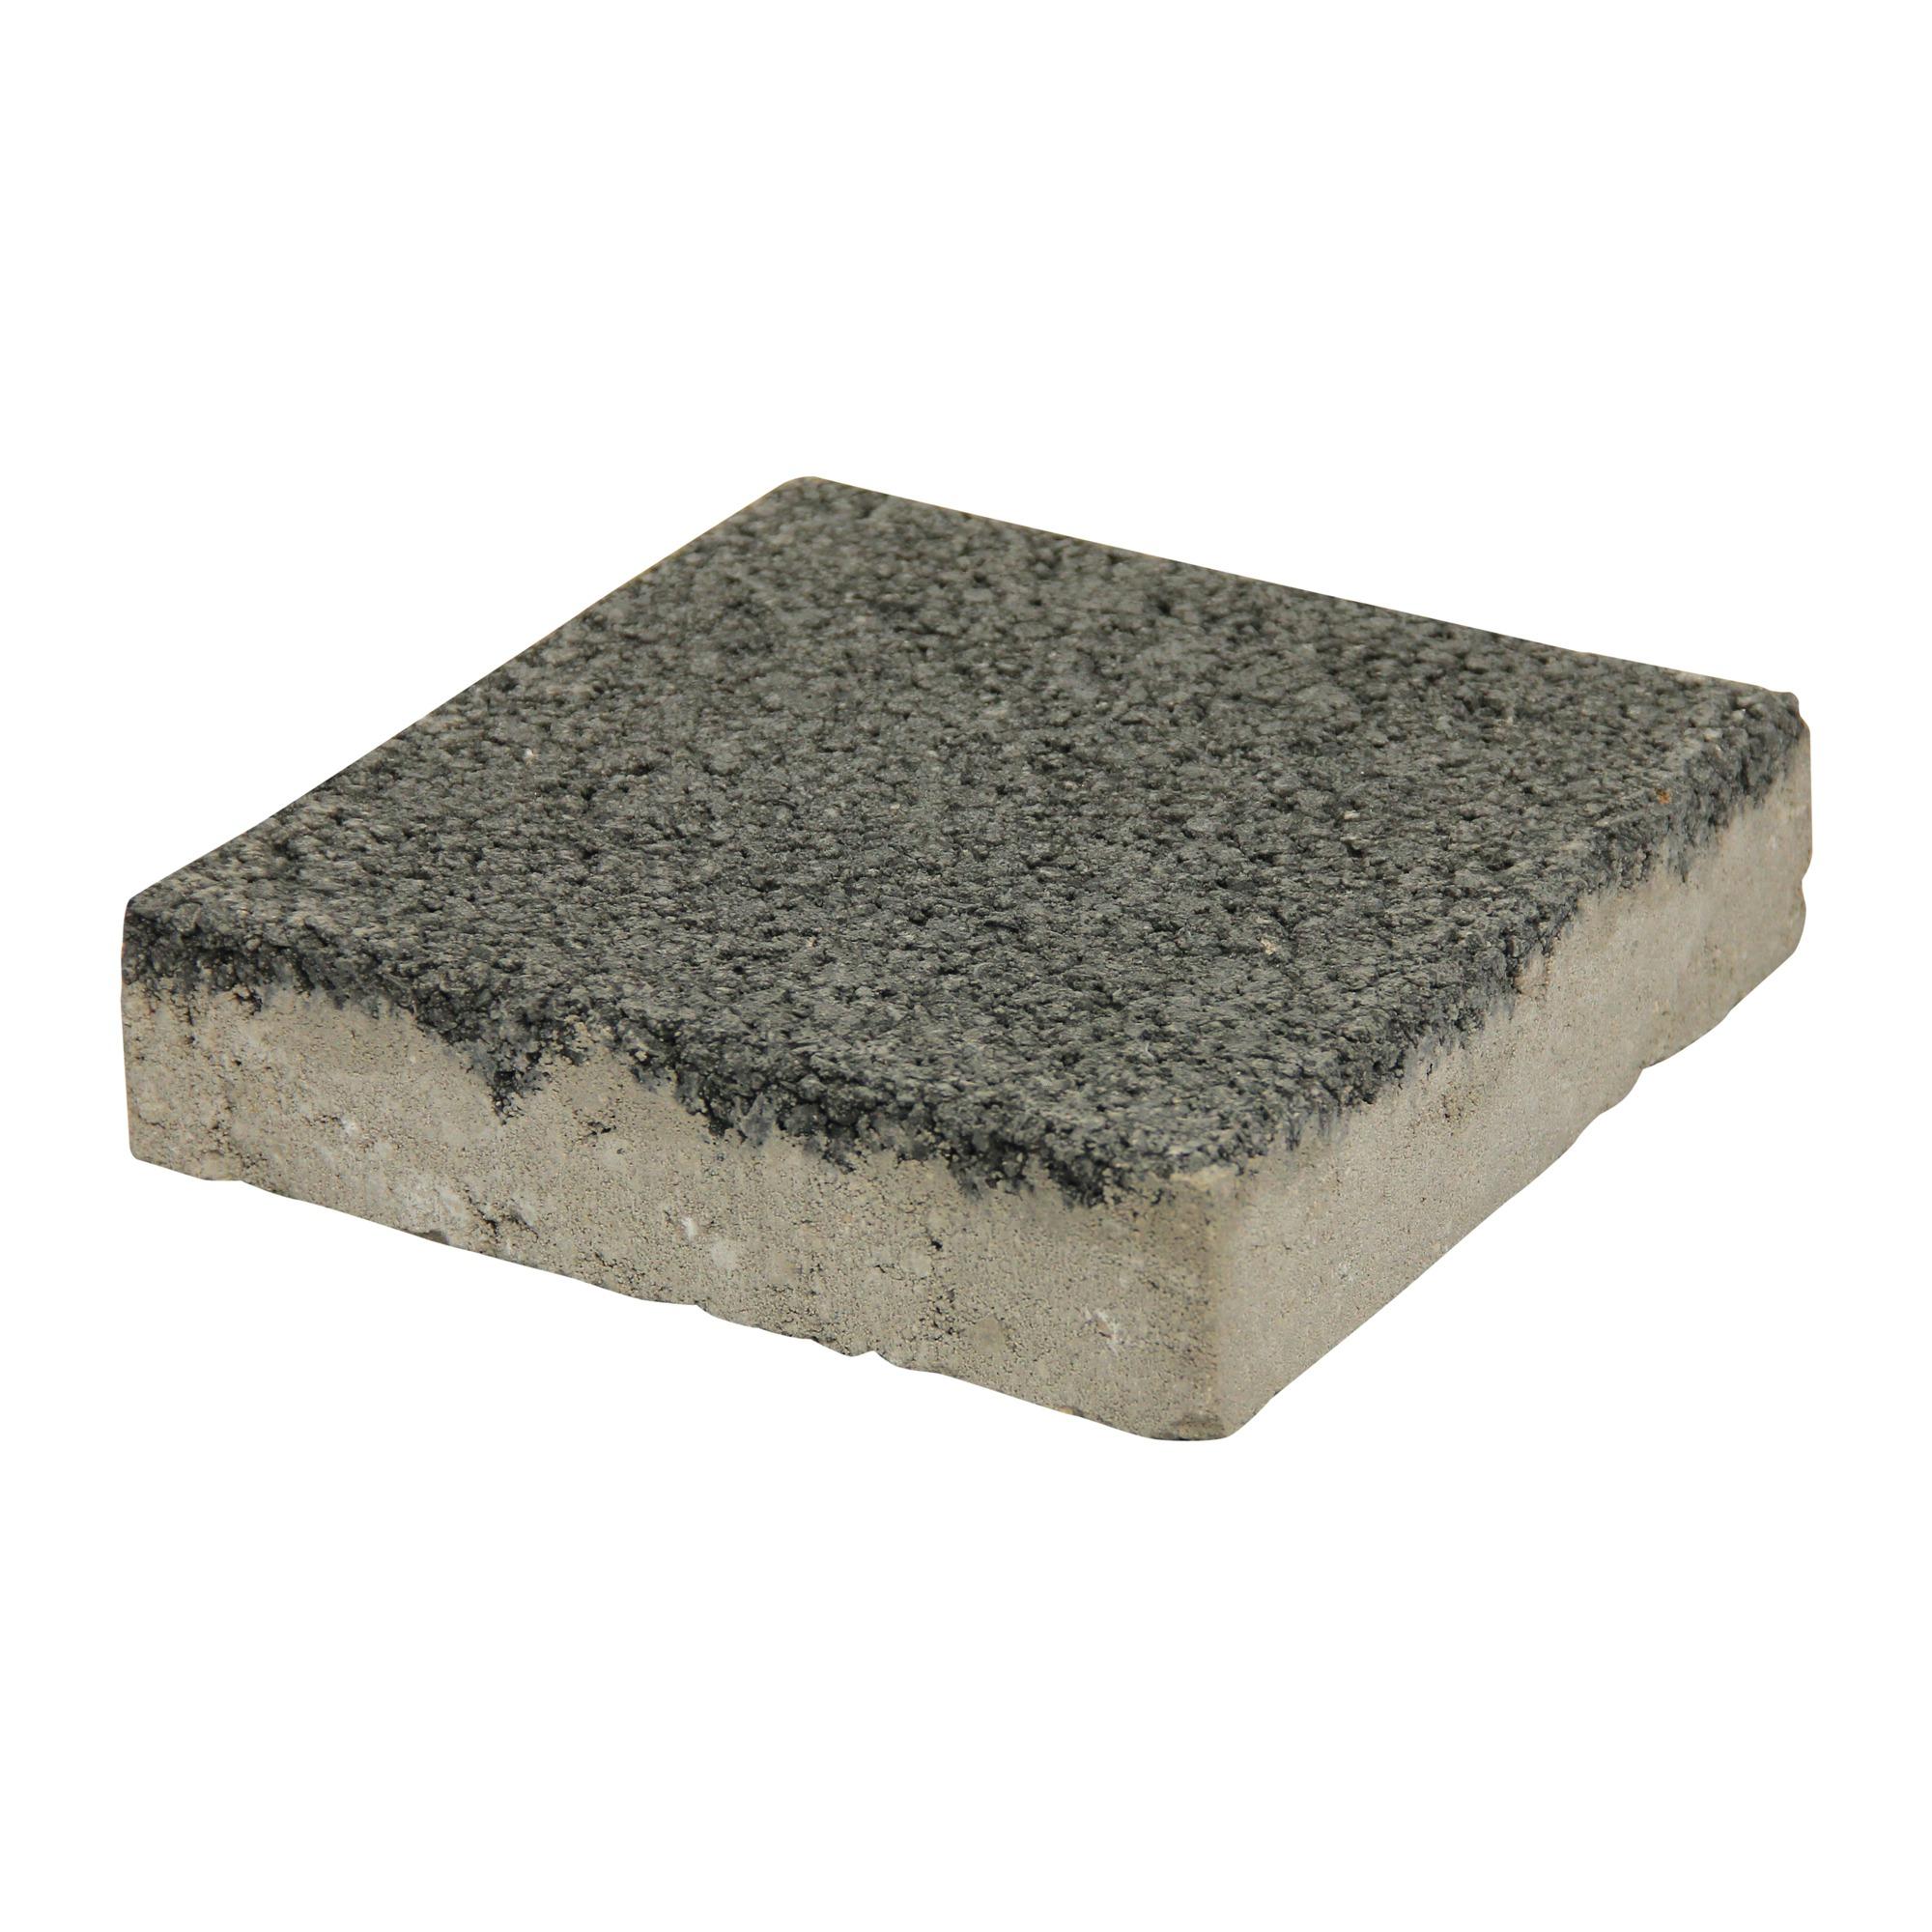 Pasblok Beton Zwart 20x20 cm - 150 Stuks - 6,0 m2